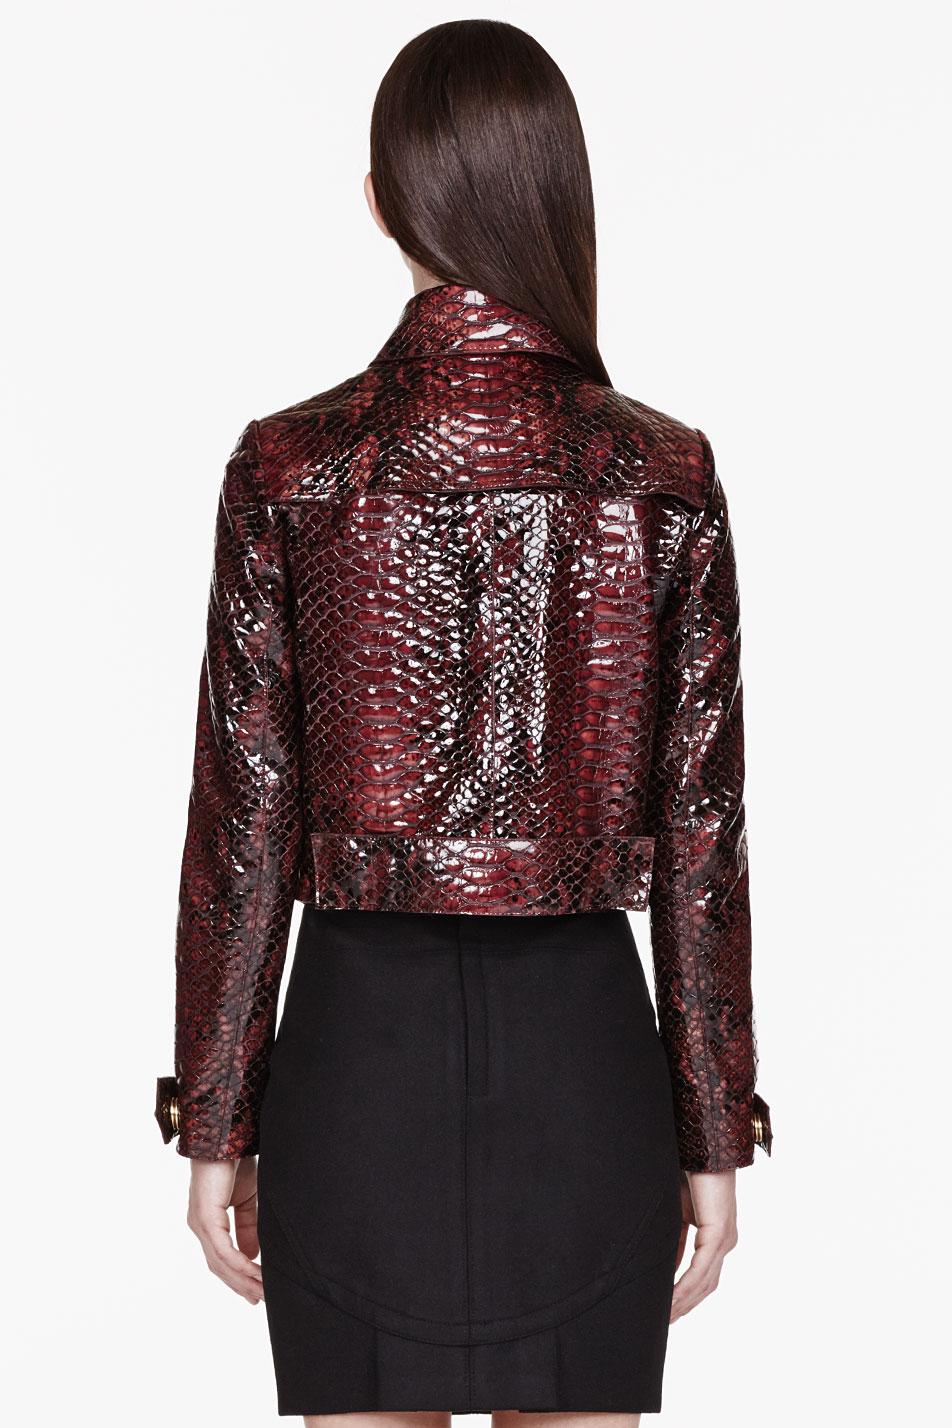 Burberry Prorsum Burgundy Patent Leather Python Jacket in